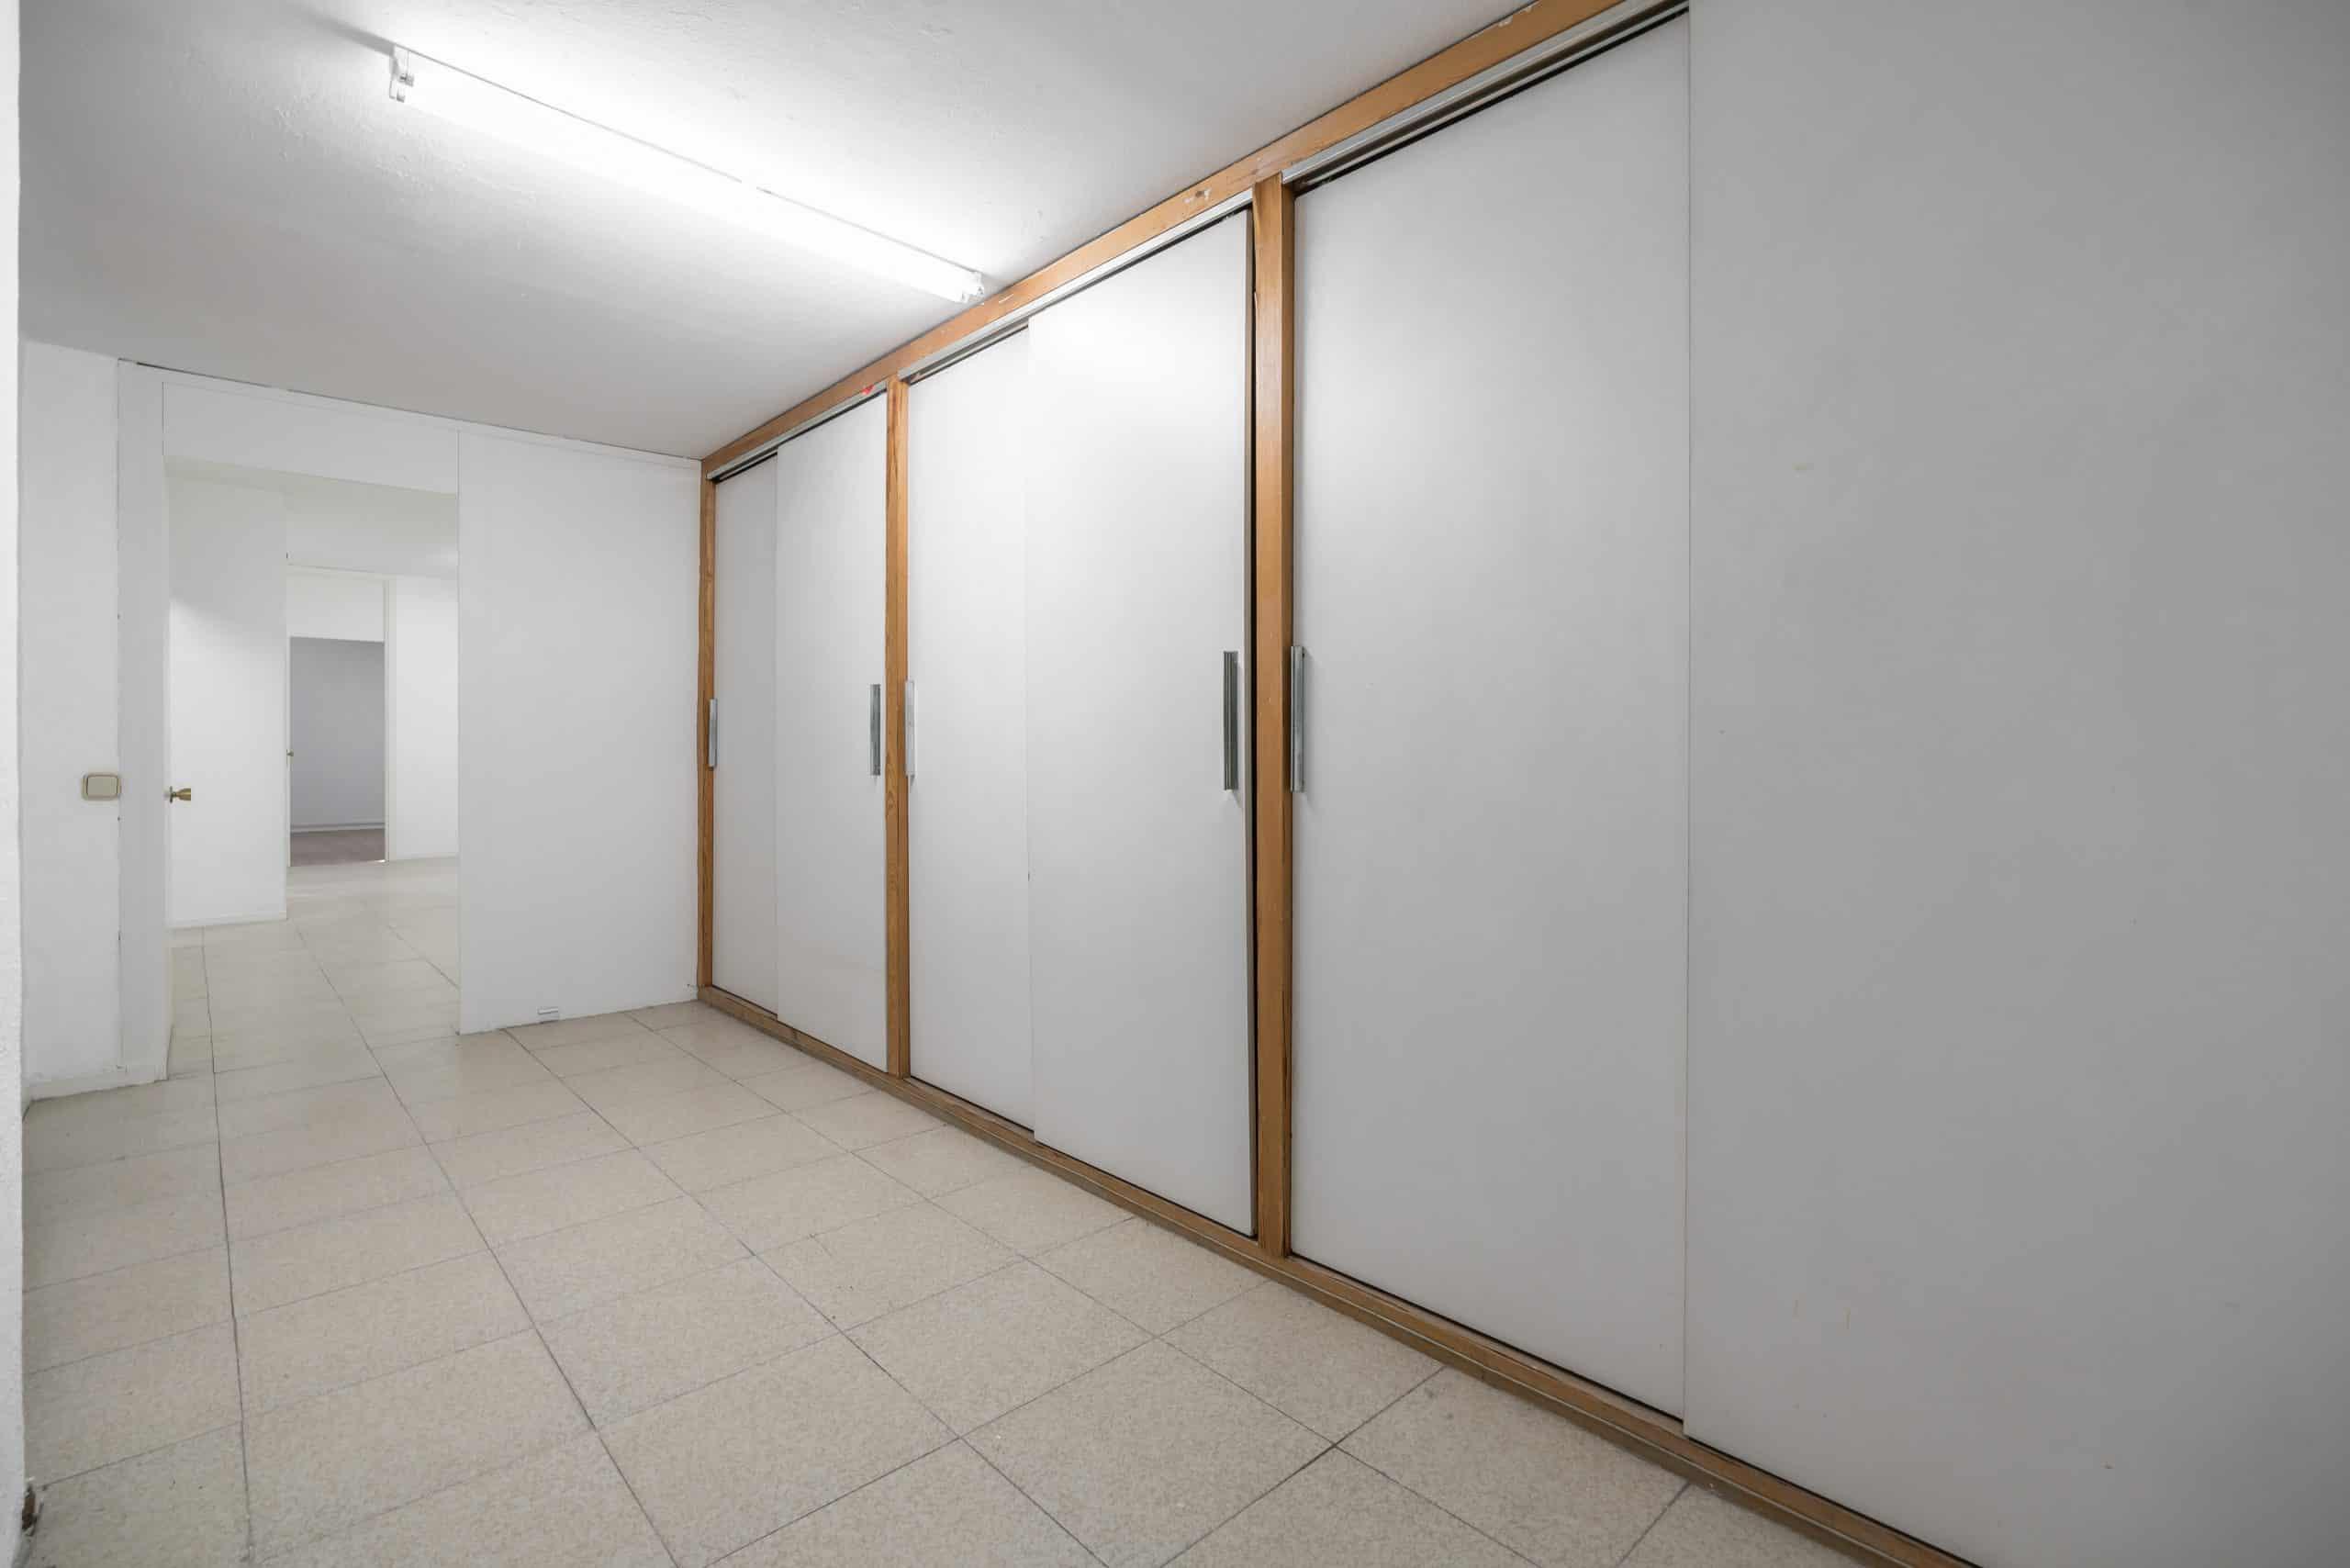 Agencia Inmobiliaria de Madrid-FUTUROCASA-Zona ARGANZUELA-LEGAZPI -calle Modesto Lafuente 41,1ºC estancia 8